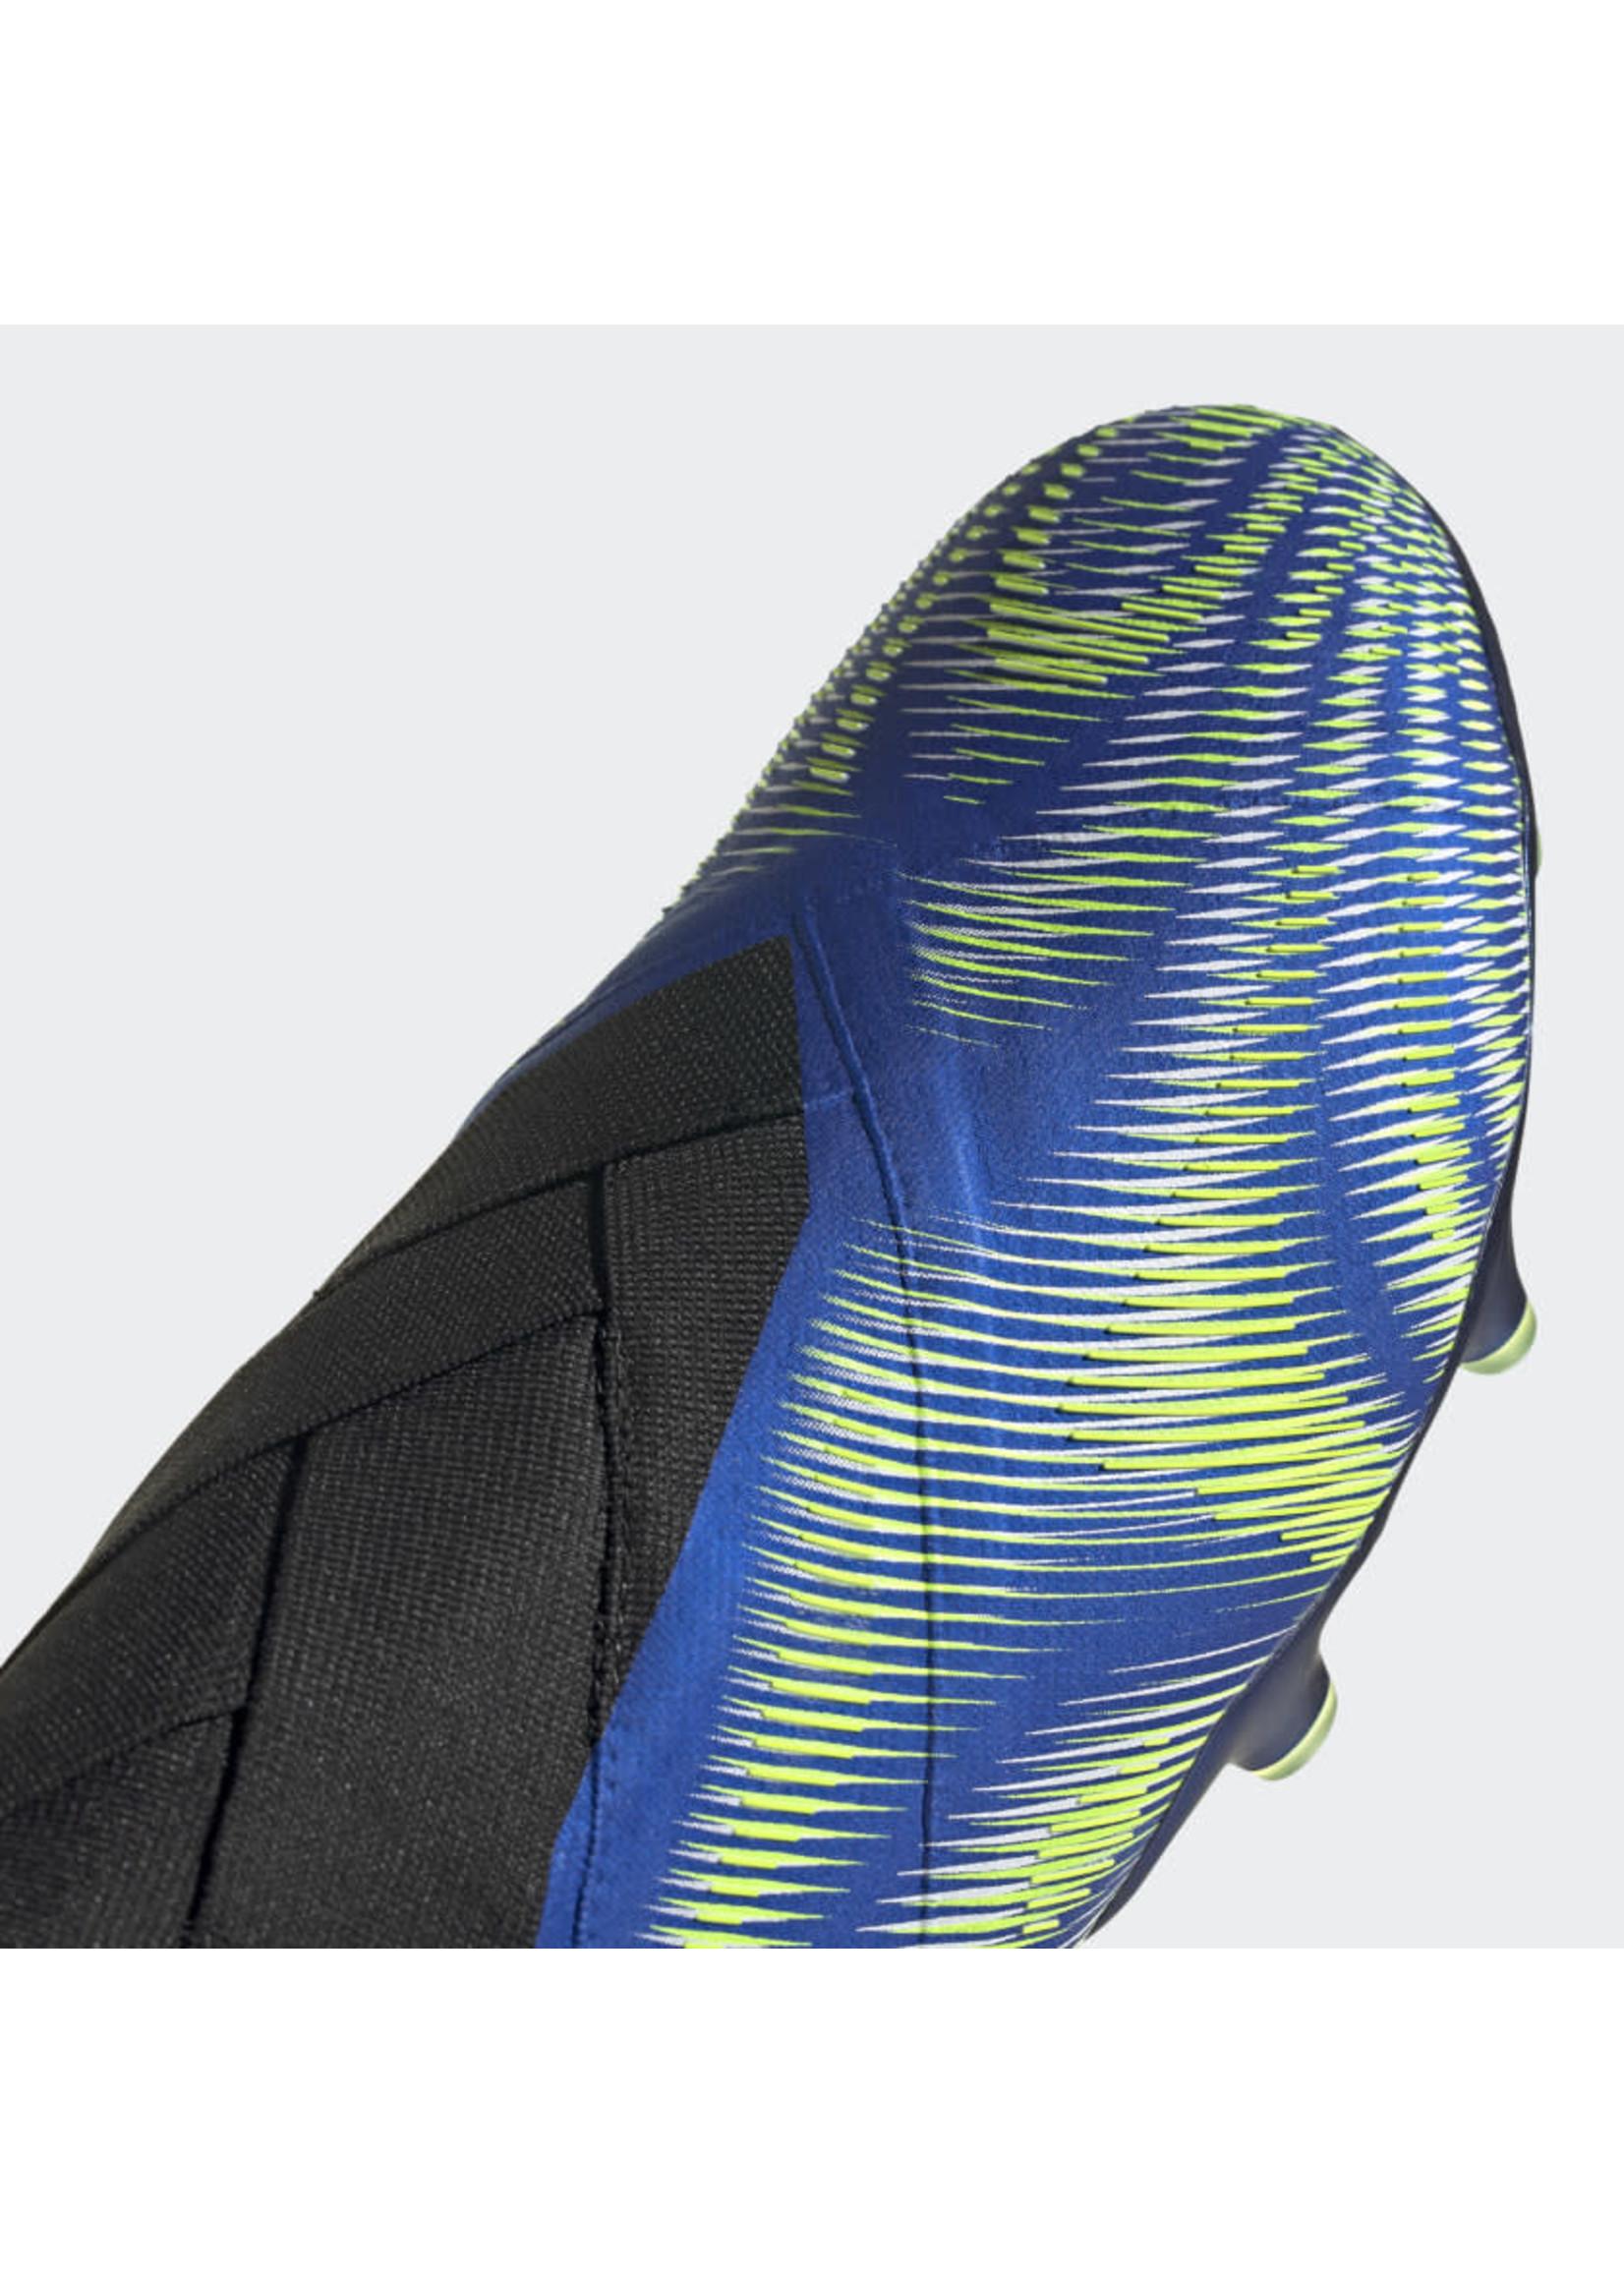 Adidas Nemeziz + FG - Blue/Yellow